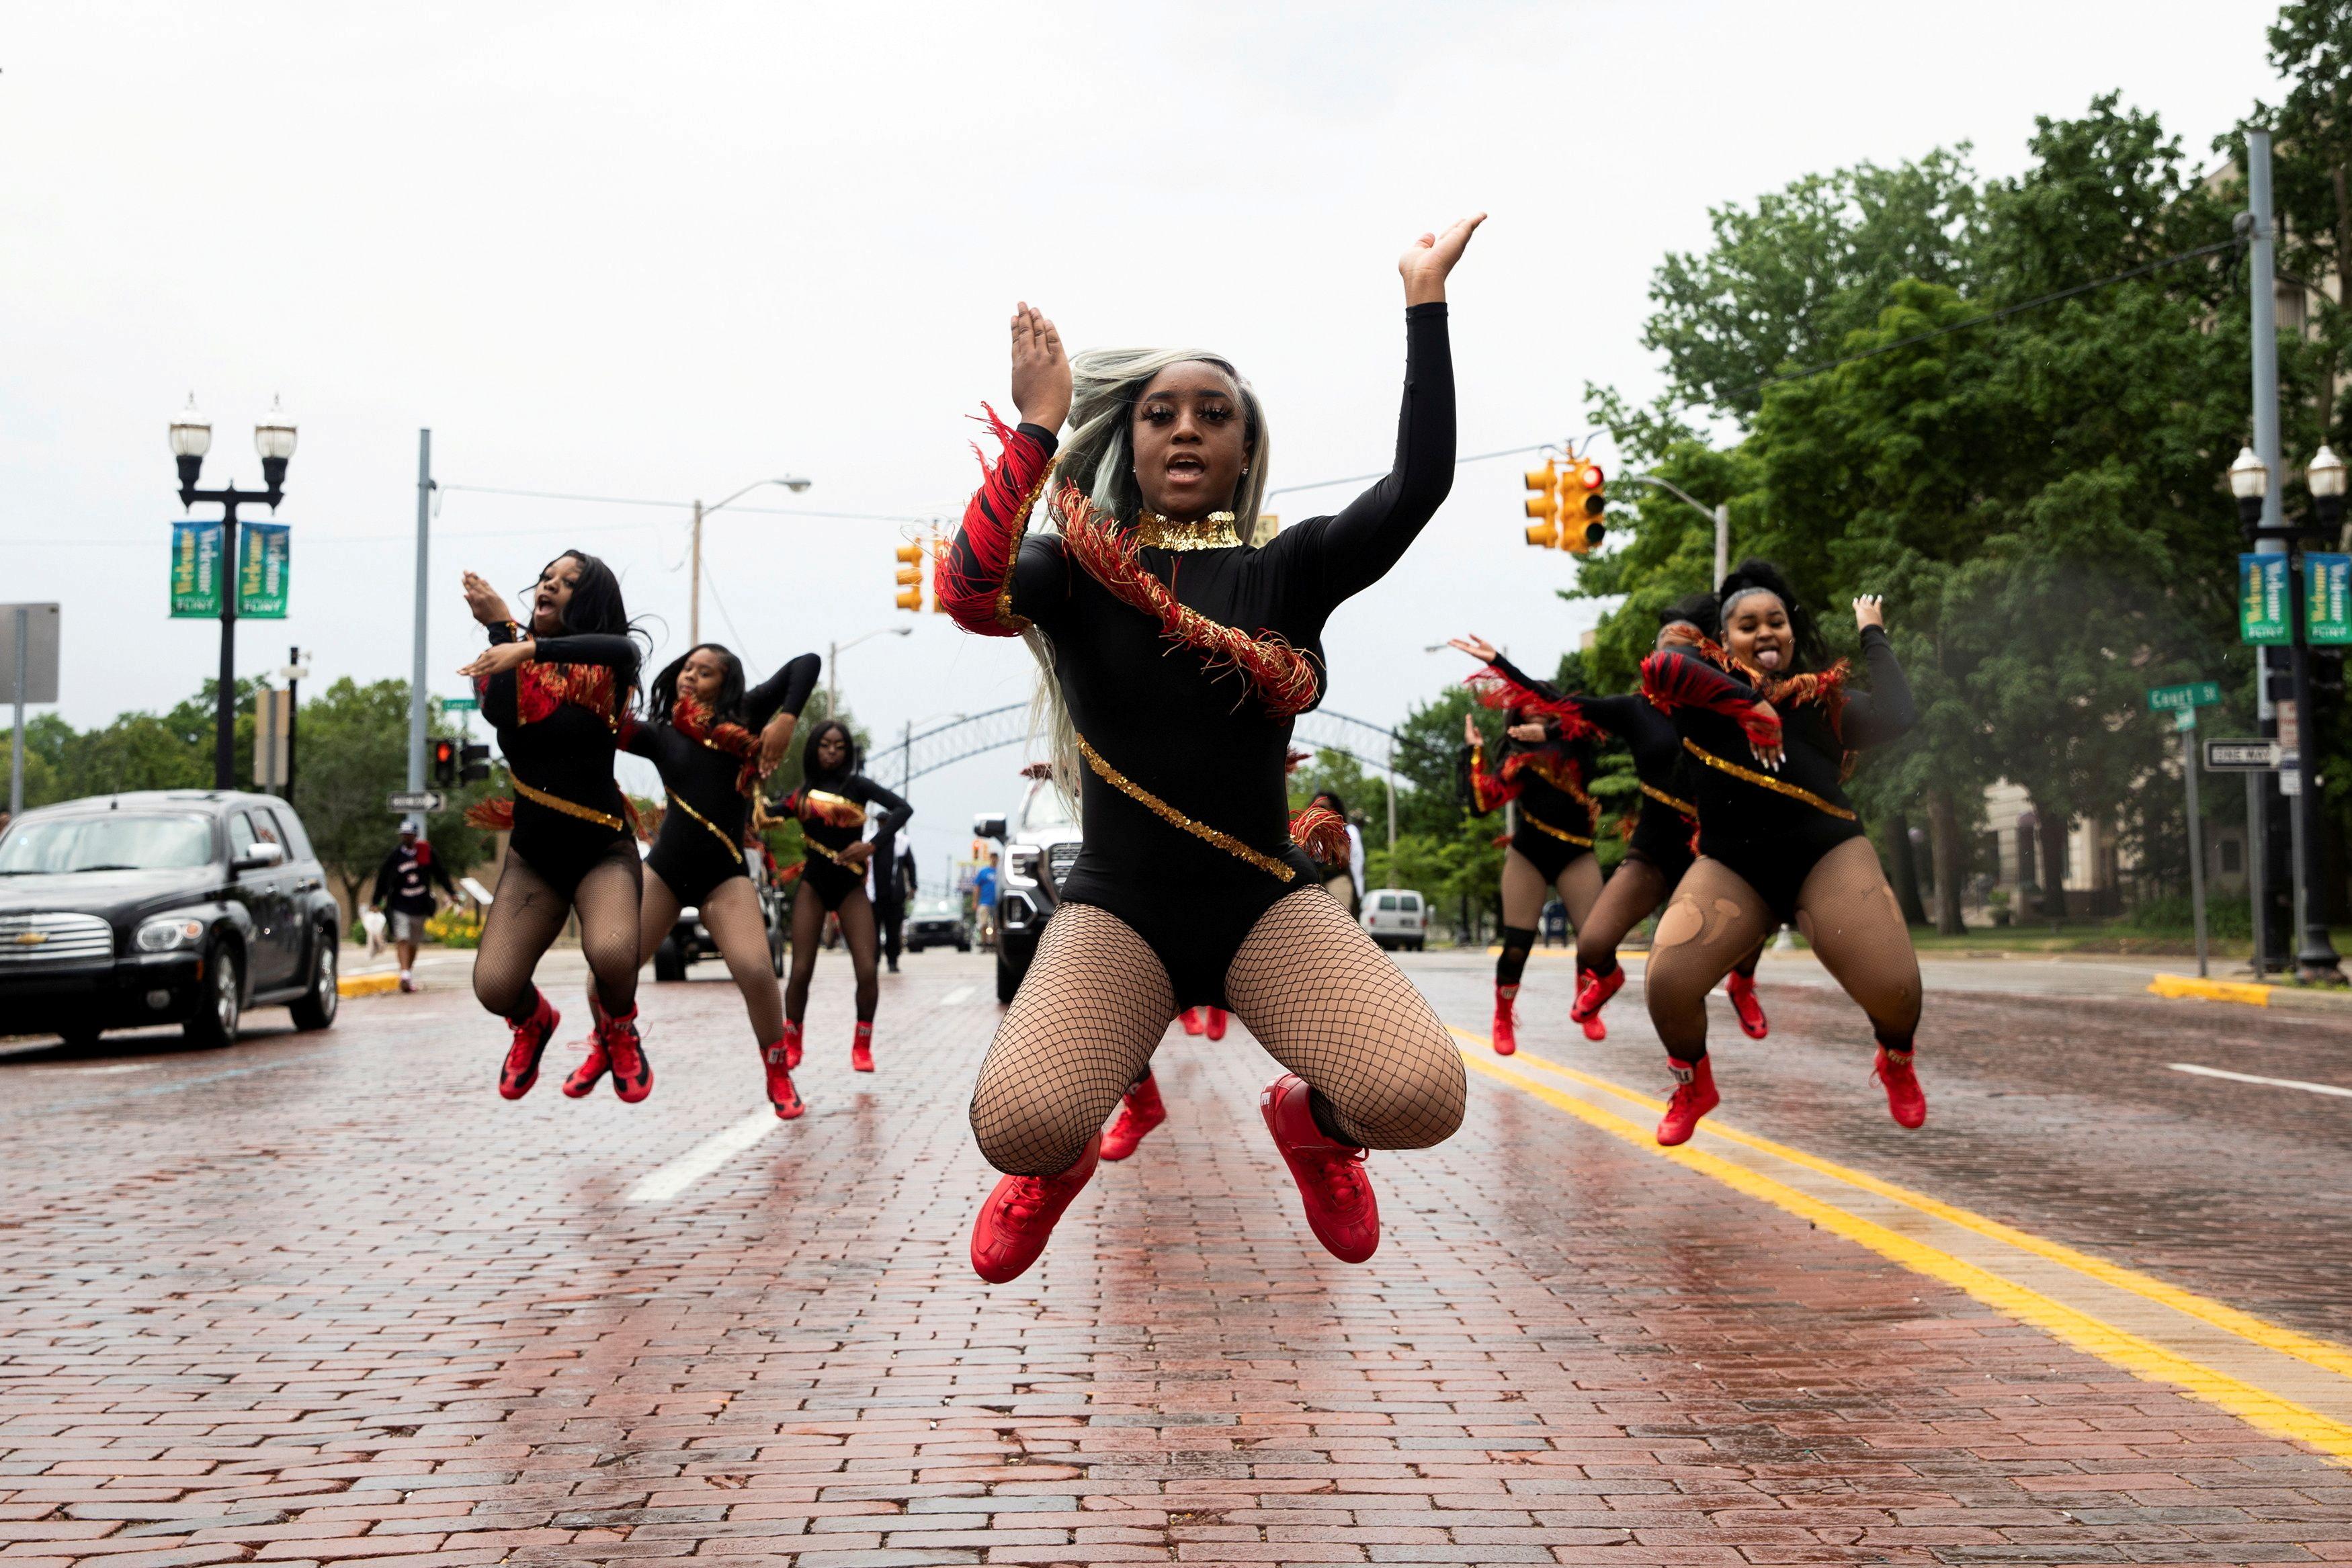 Dance captain Shair'Mae Harris, 17, leads members from